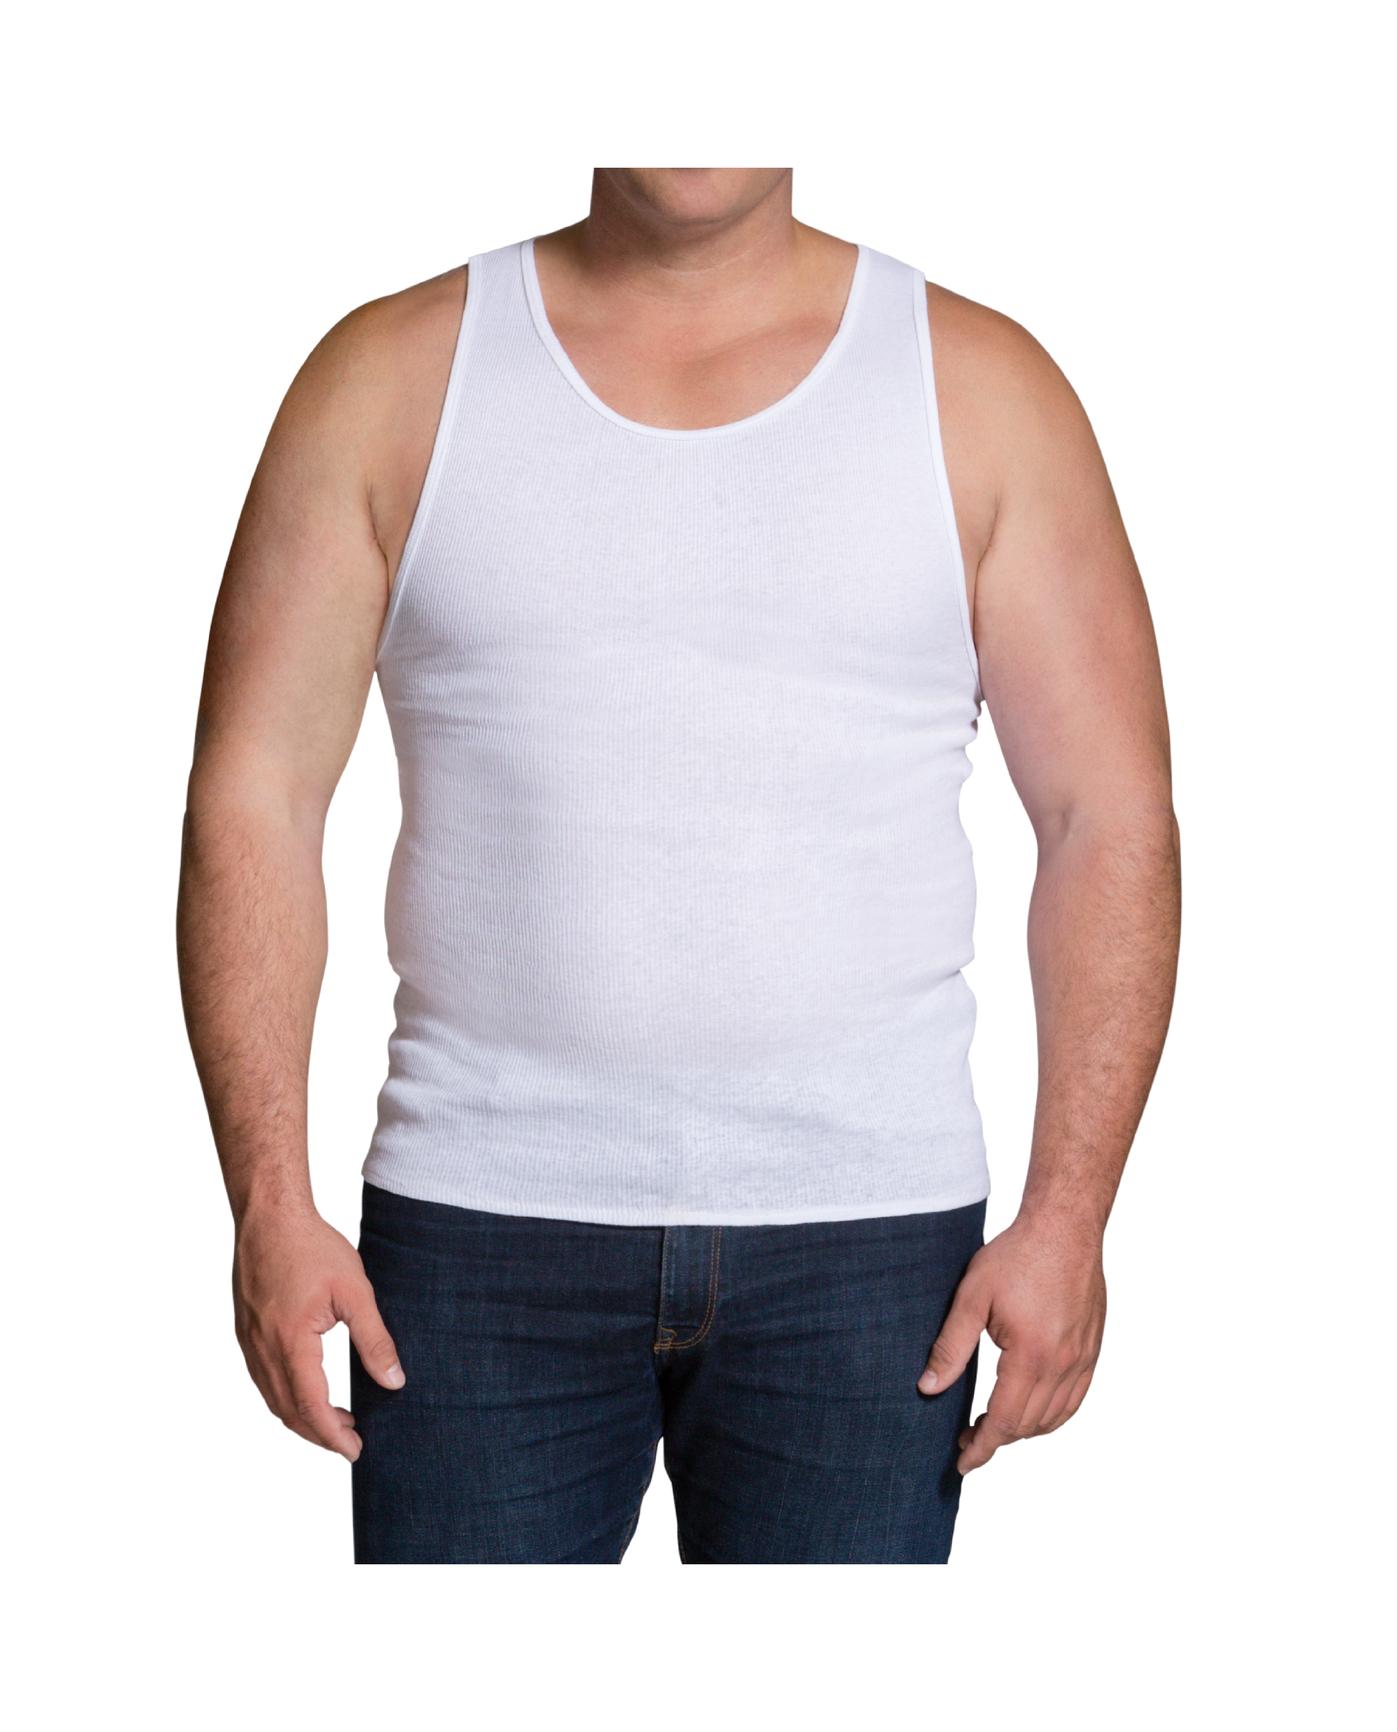 c412b904a9bb8 ... Big Men s Collection White A Shirt